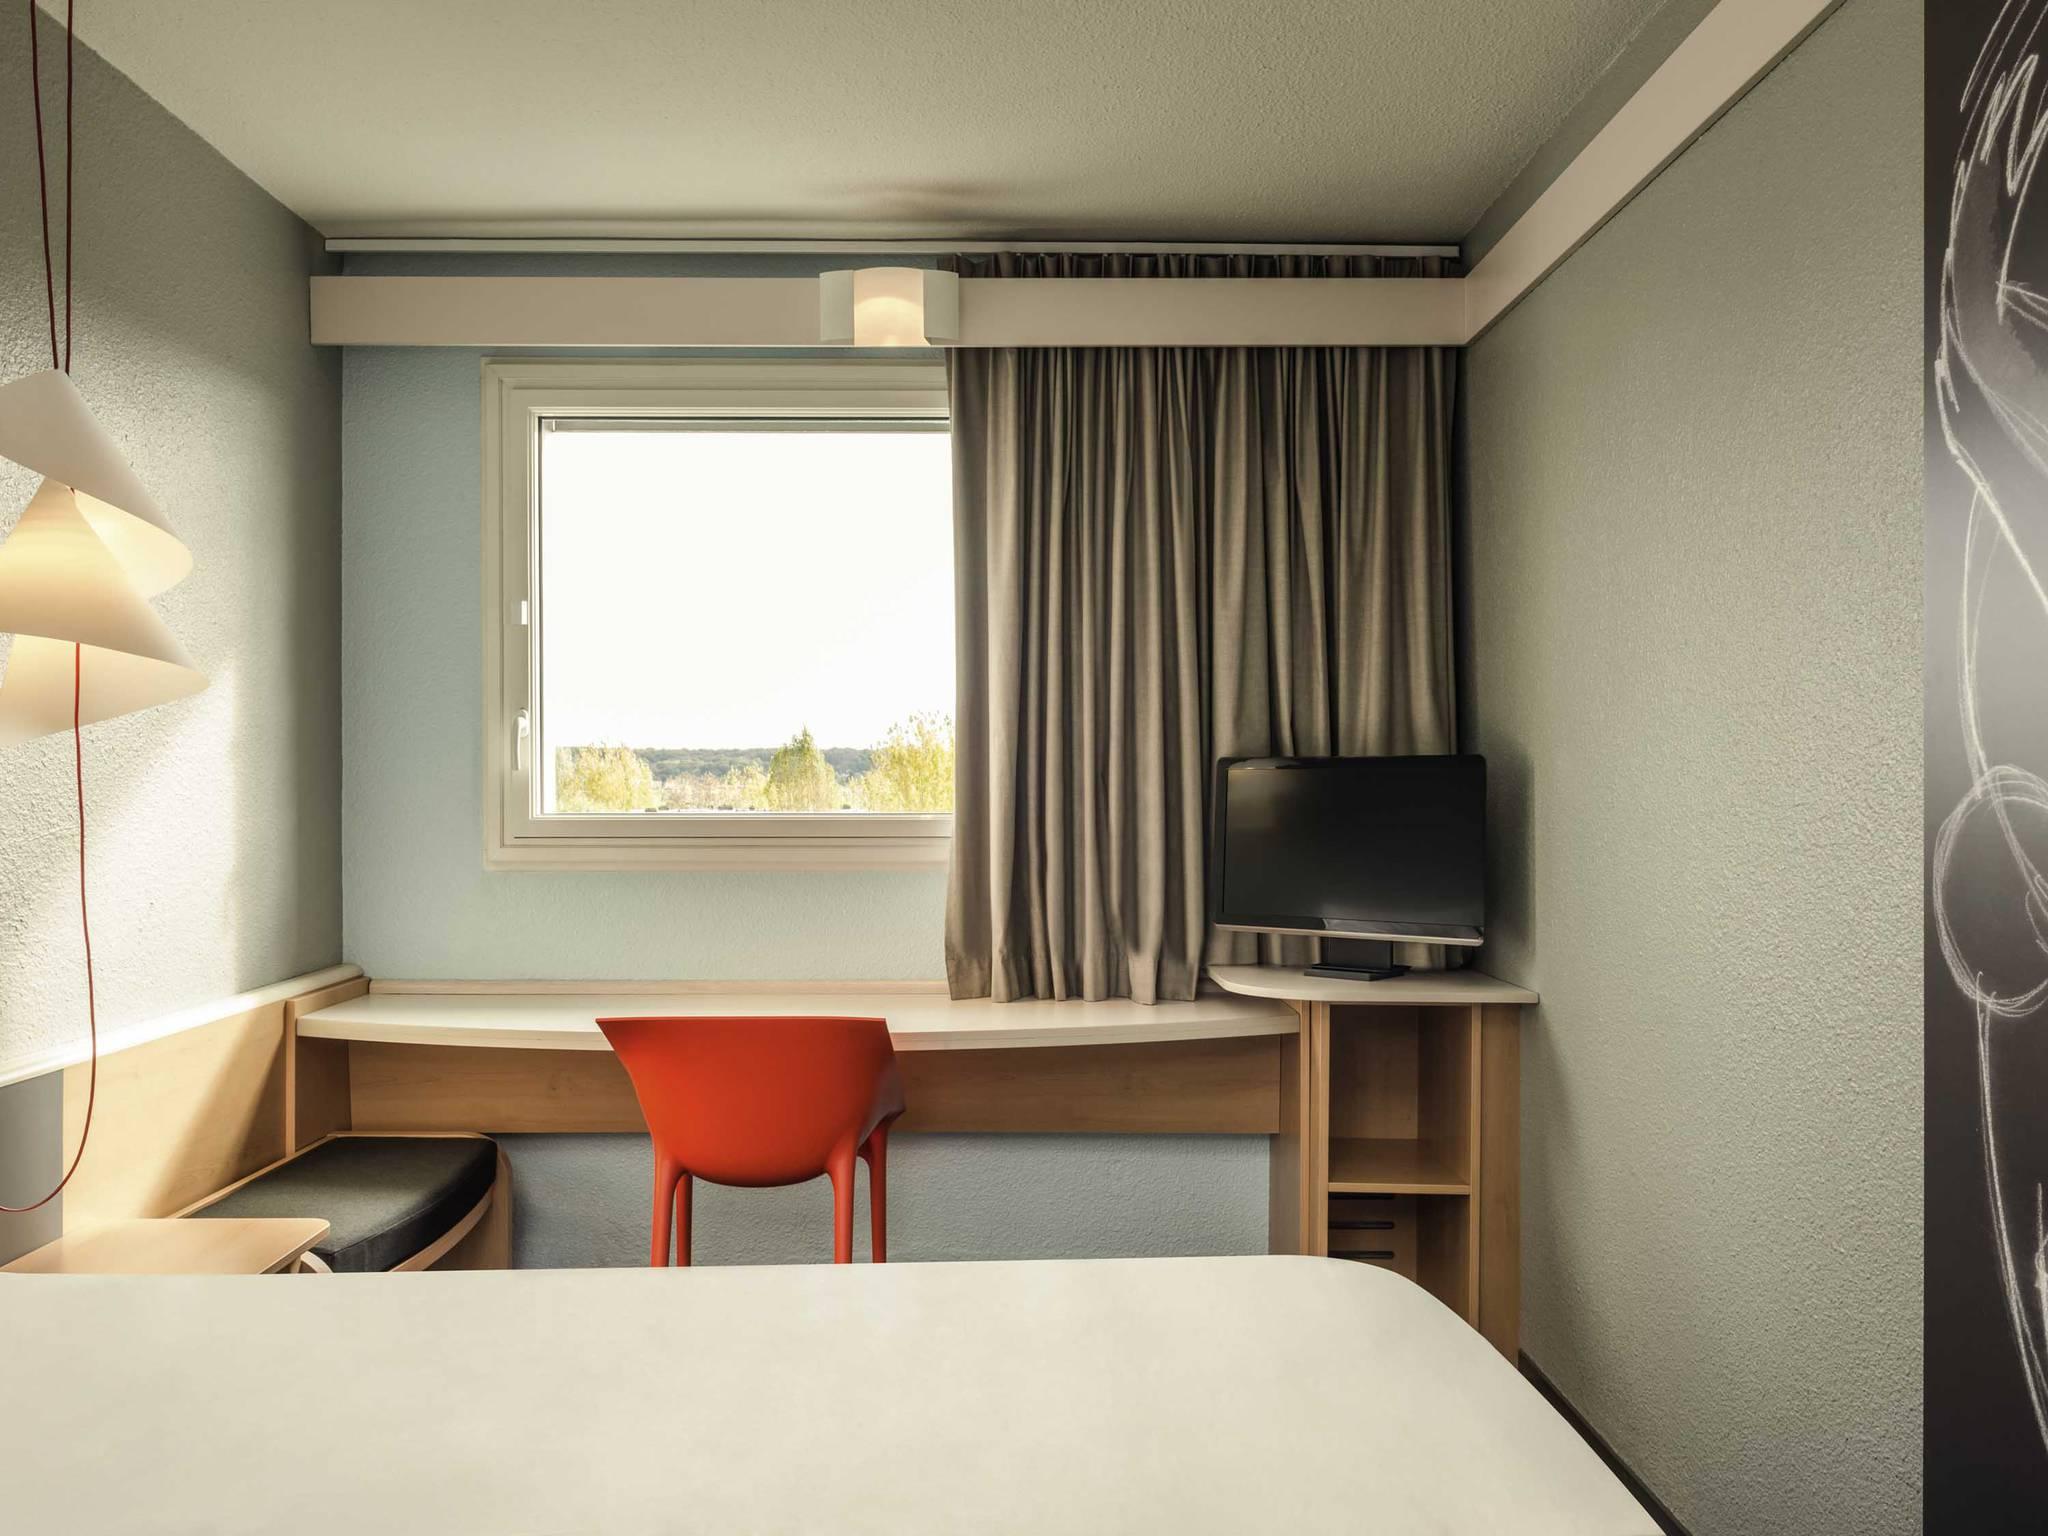 Hotel Ibis Le Chesnay